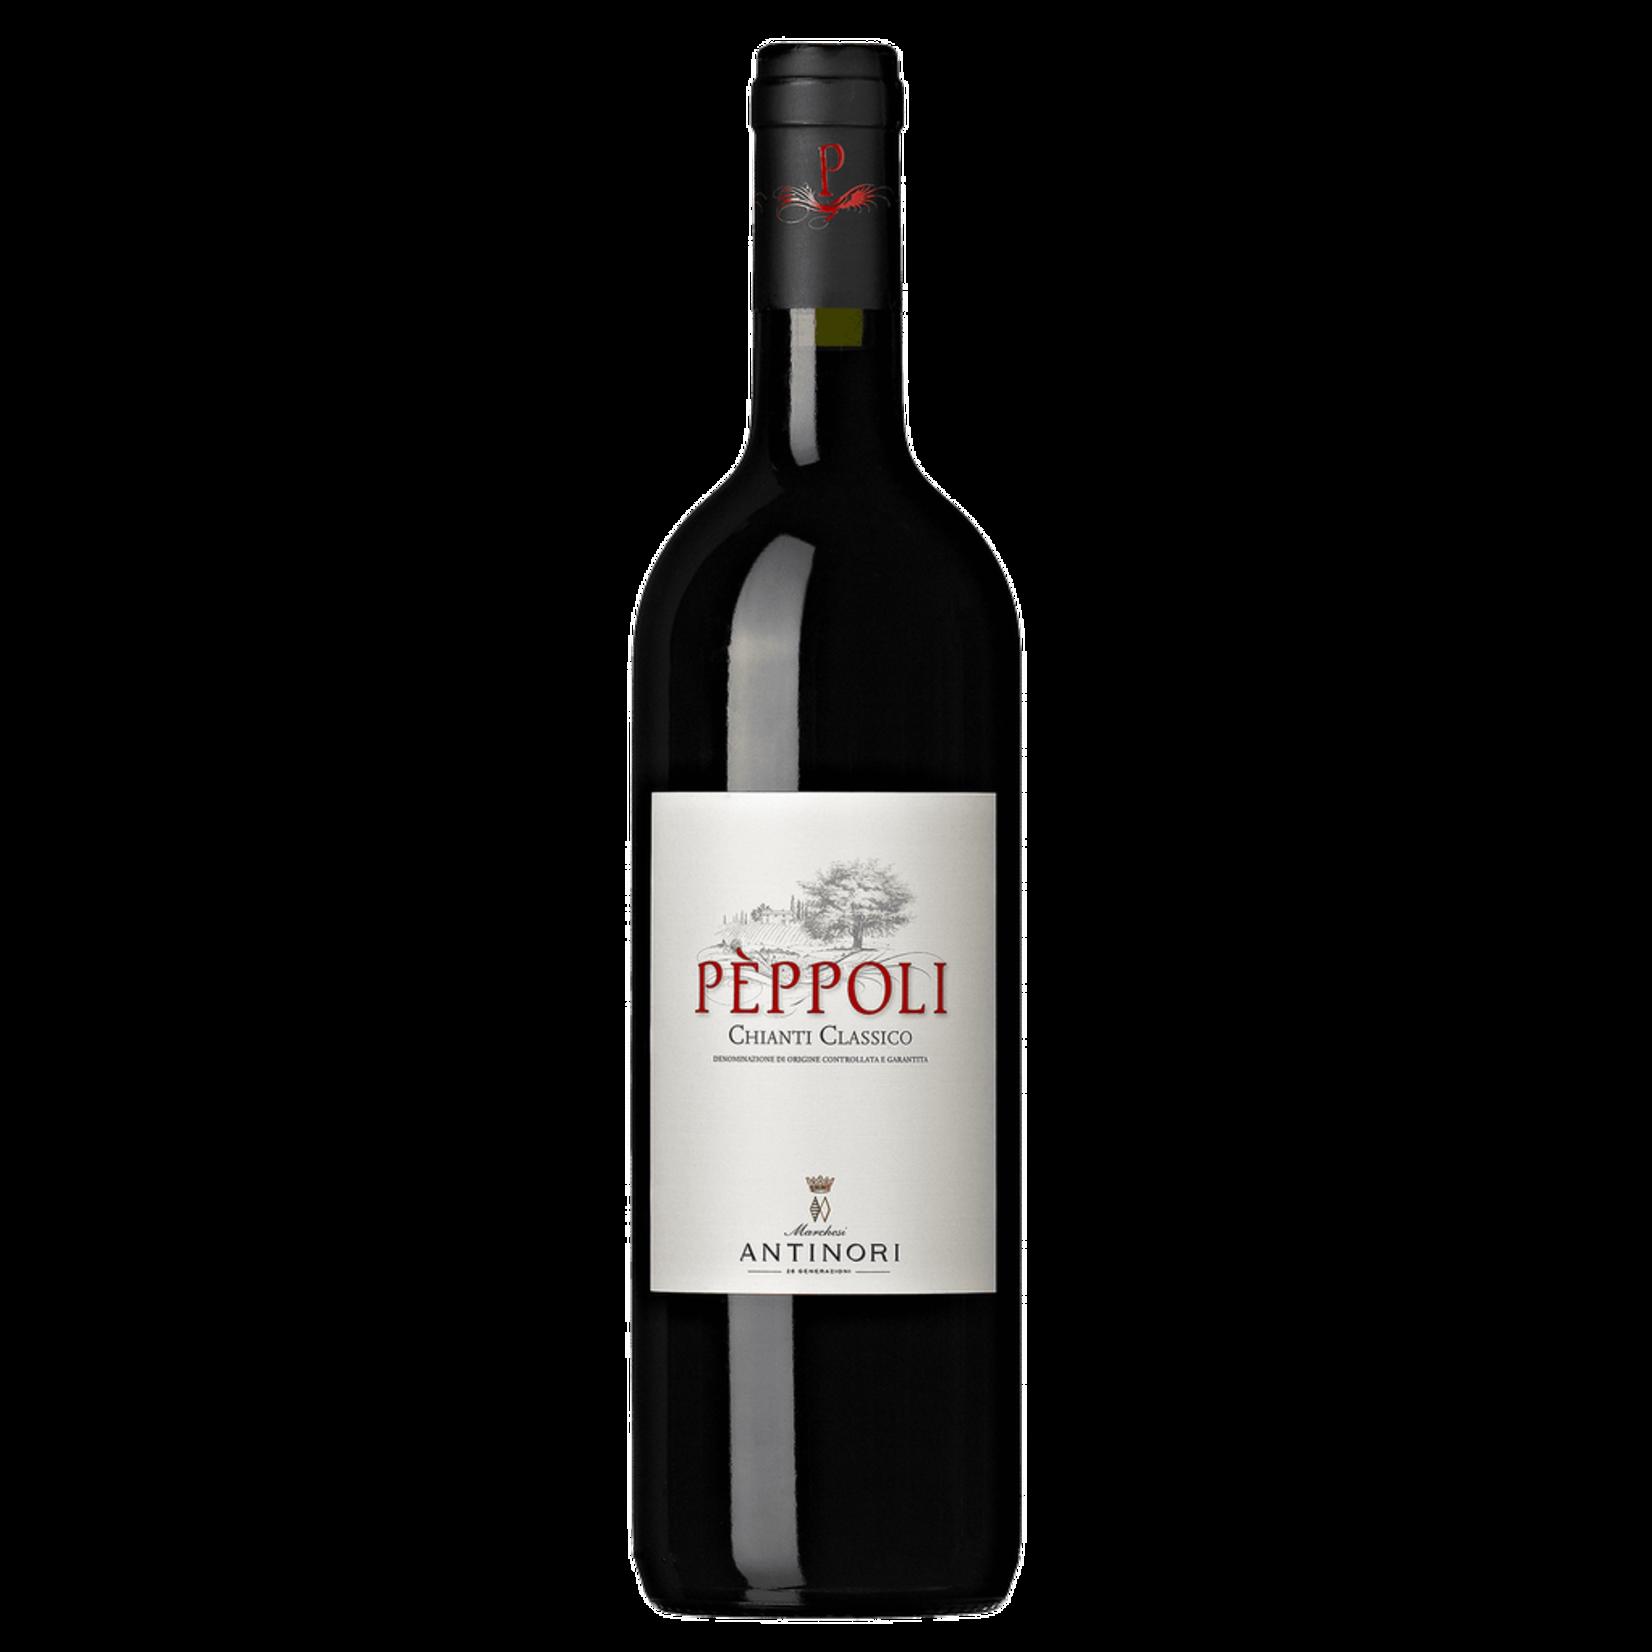 Wine Antinori Chianti Classico Peppoli 2017